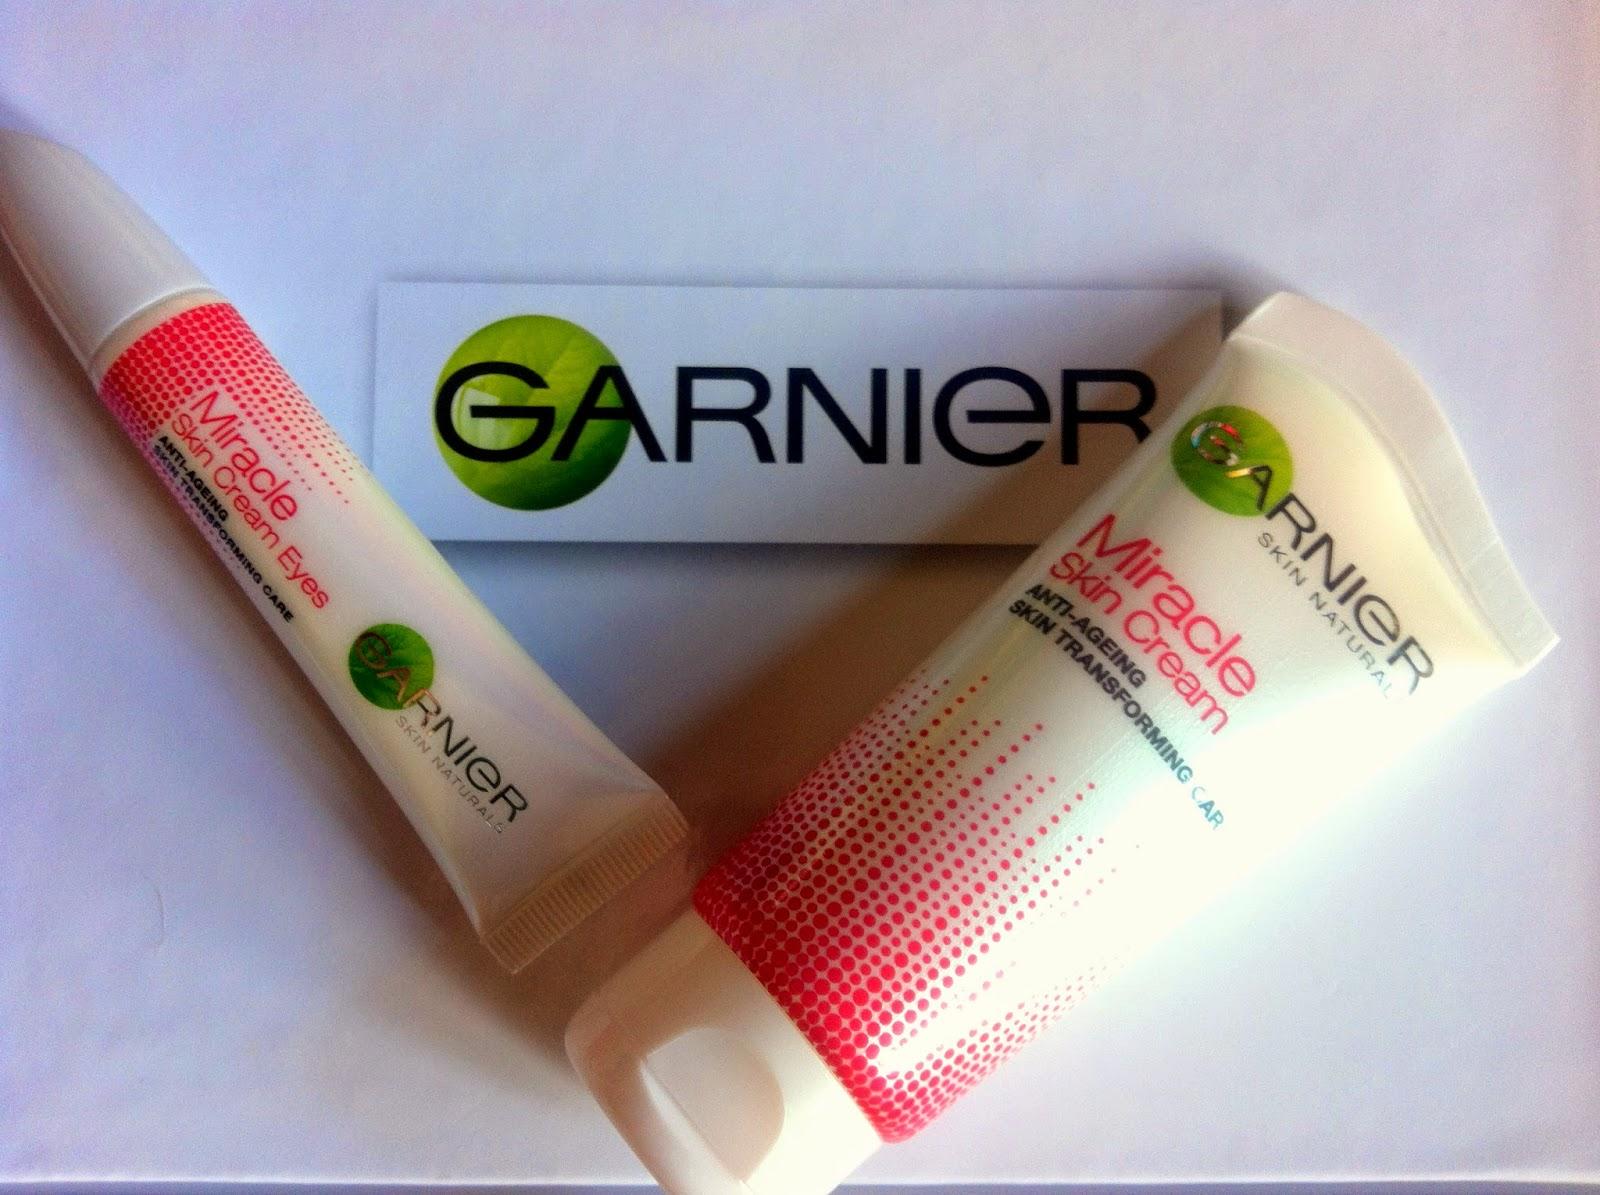 Garnier Miracle Skin Cream, occhi, occhiaie, crema anti età, review, opinione, inci